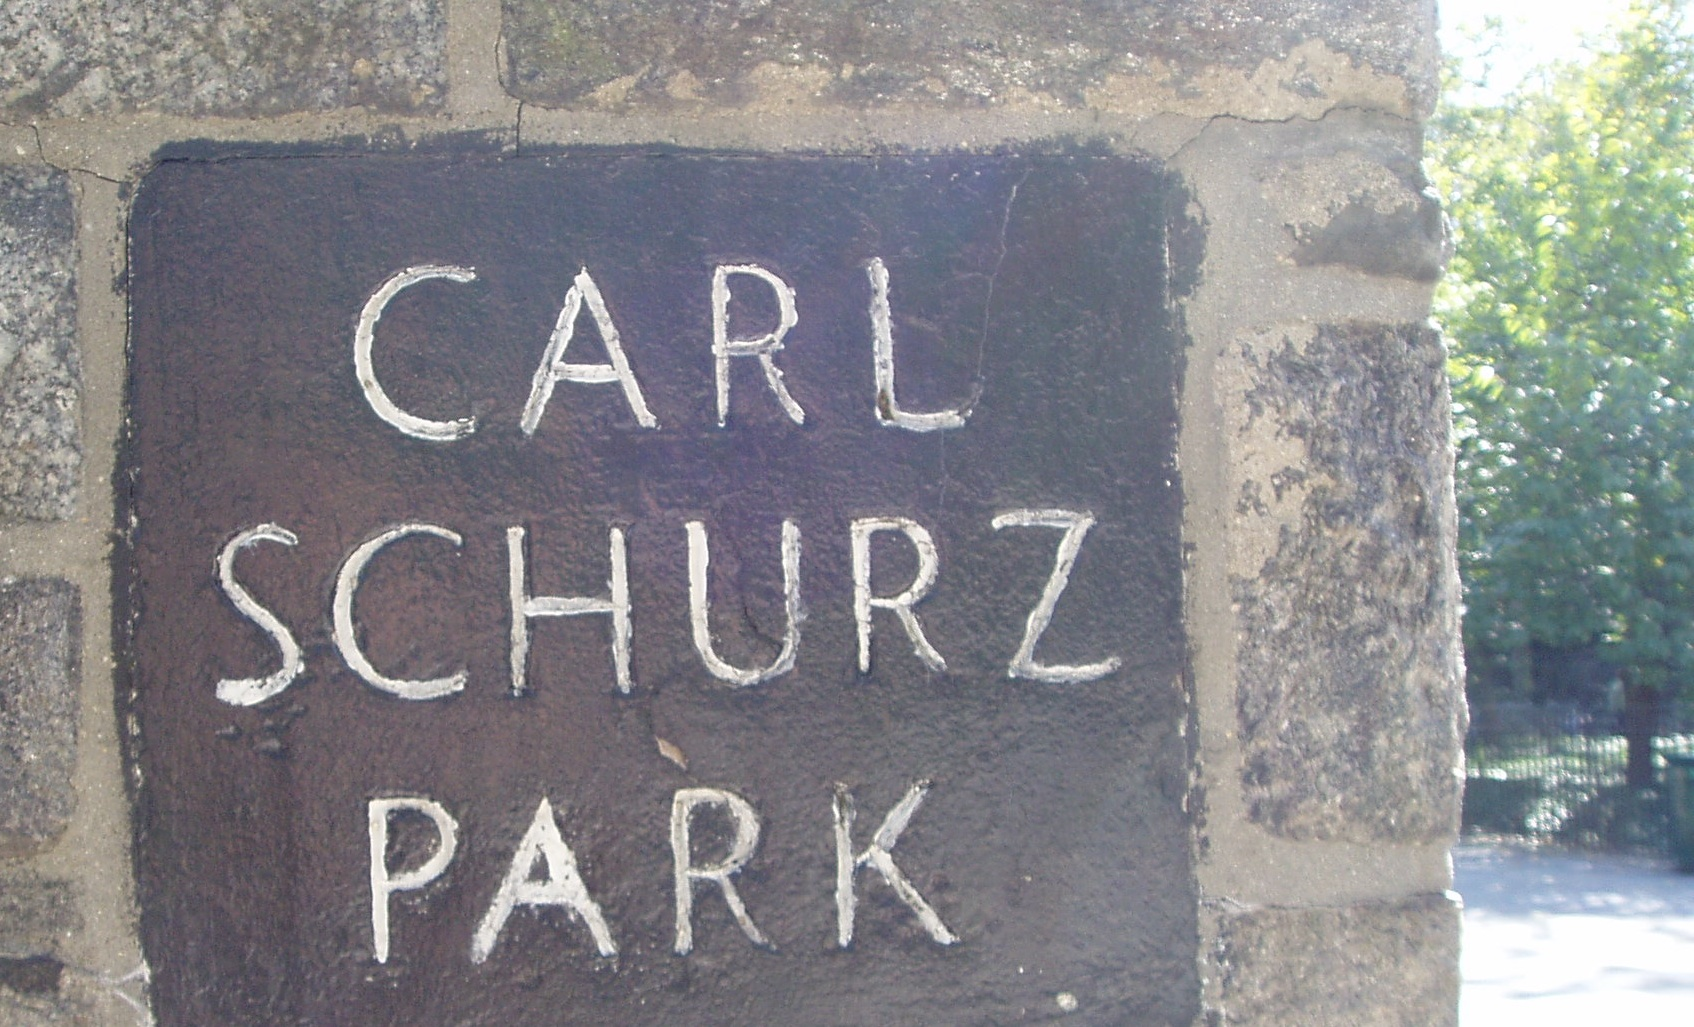 Carl Schurz Park, Manhattan's East Side.